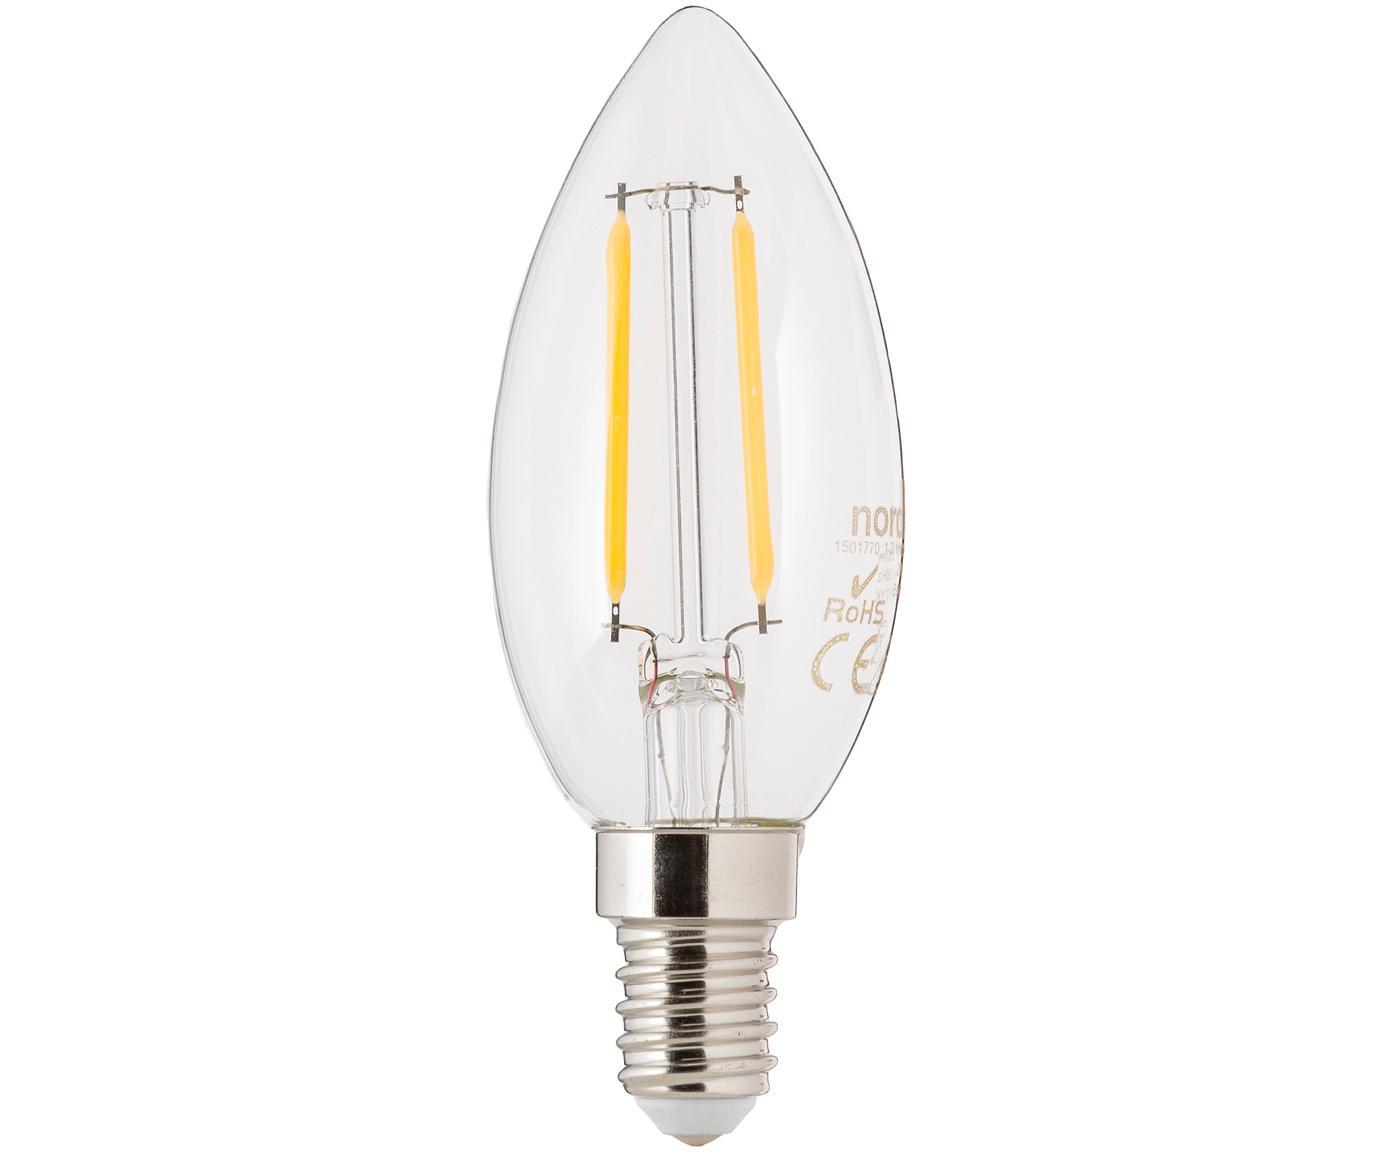 Żarówka LED Vel (E14/2,5 W), 5 szt., Transparentny, Ø 4 x W 10 cm